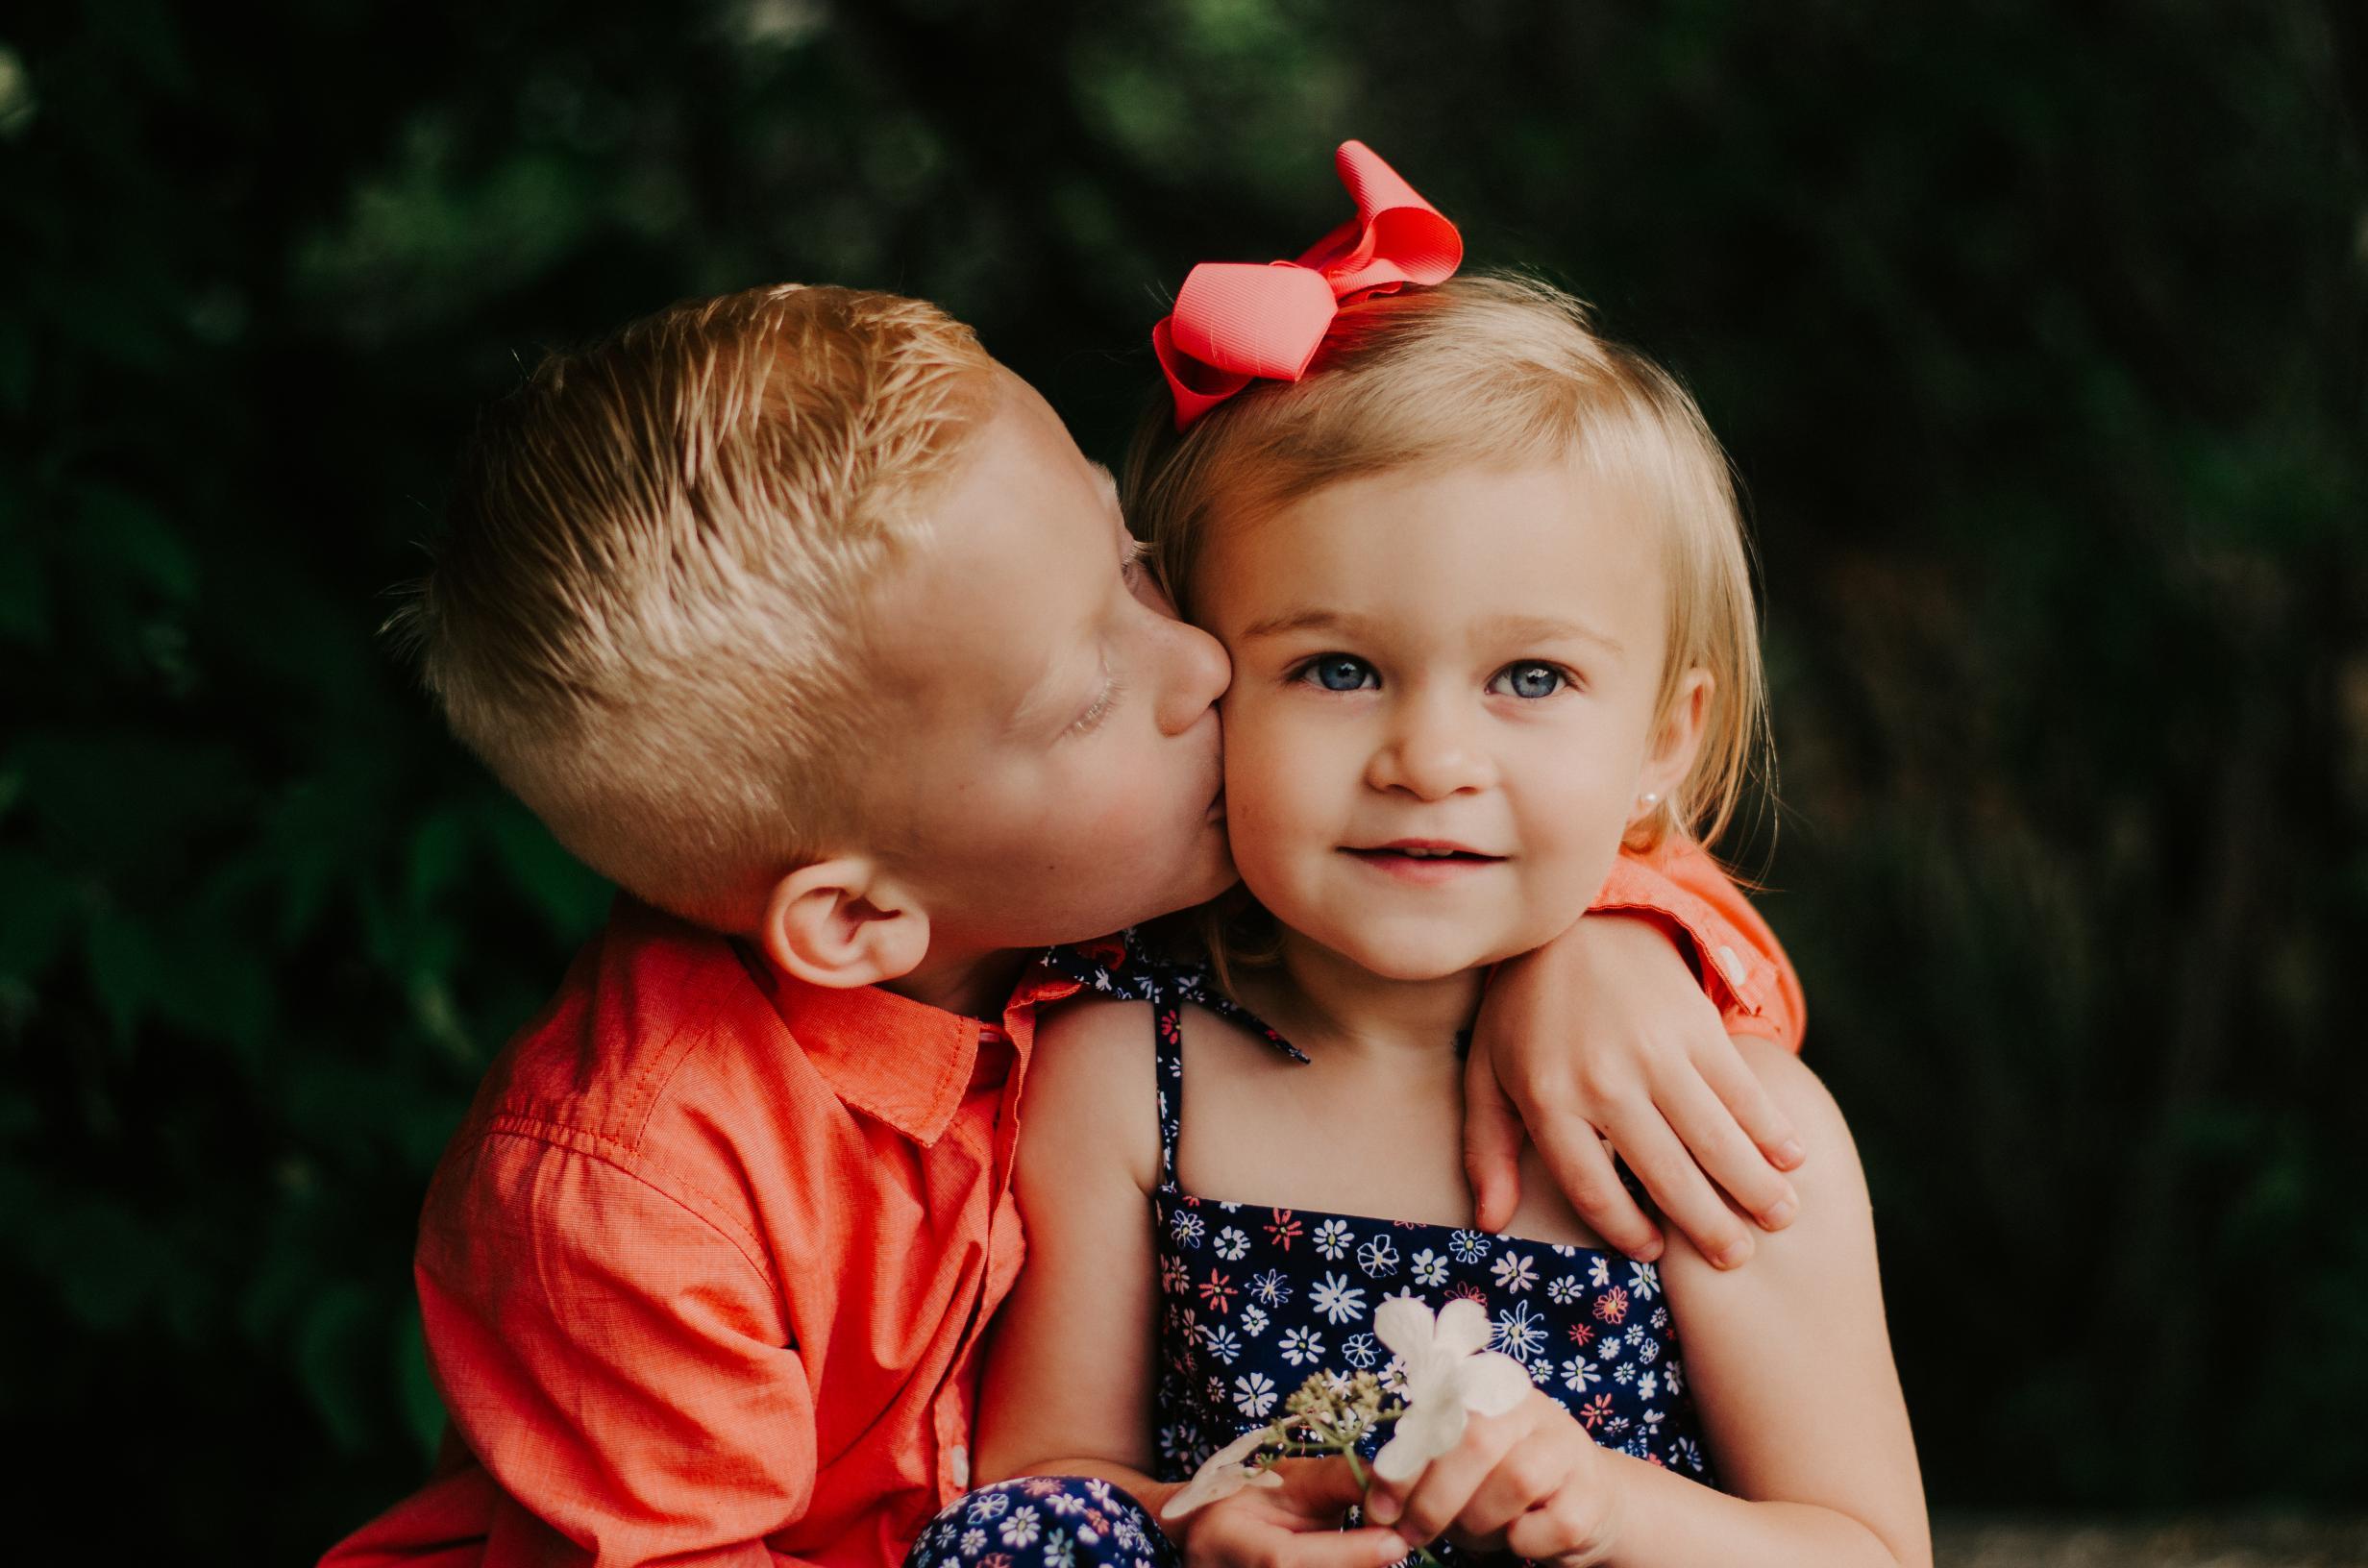 children-photography-sibling-portrait.jpg.